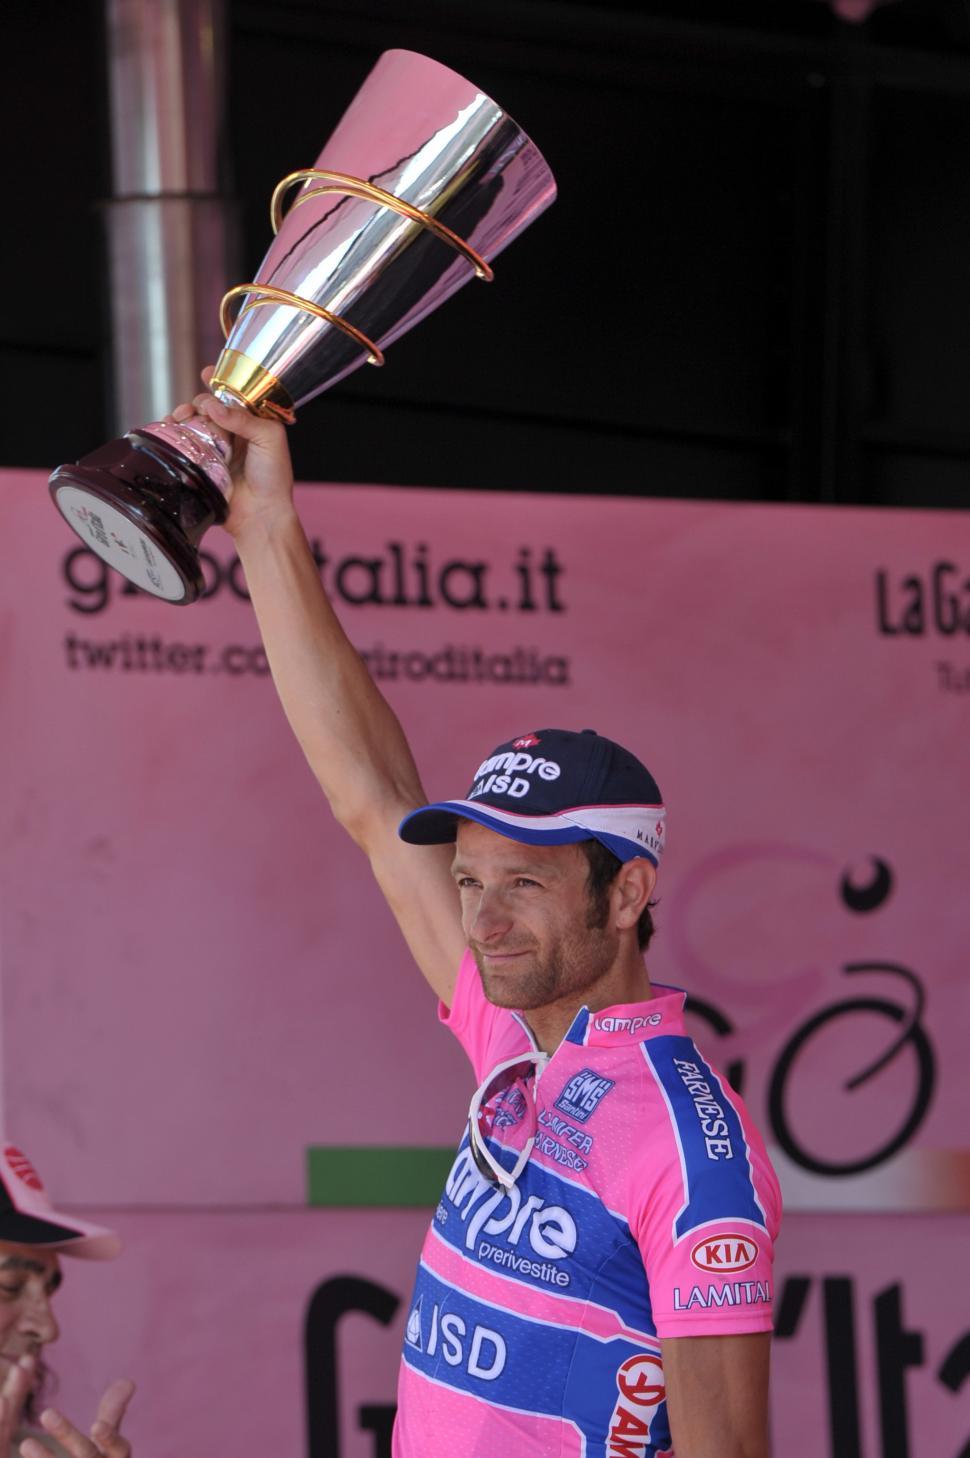 Michele Scarponi, Giro 2011 (picture Gian Mattia D'Alberto, LaPresse, RCS Sport)